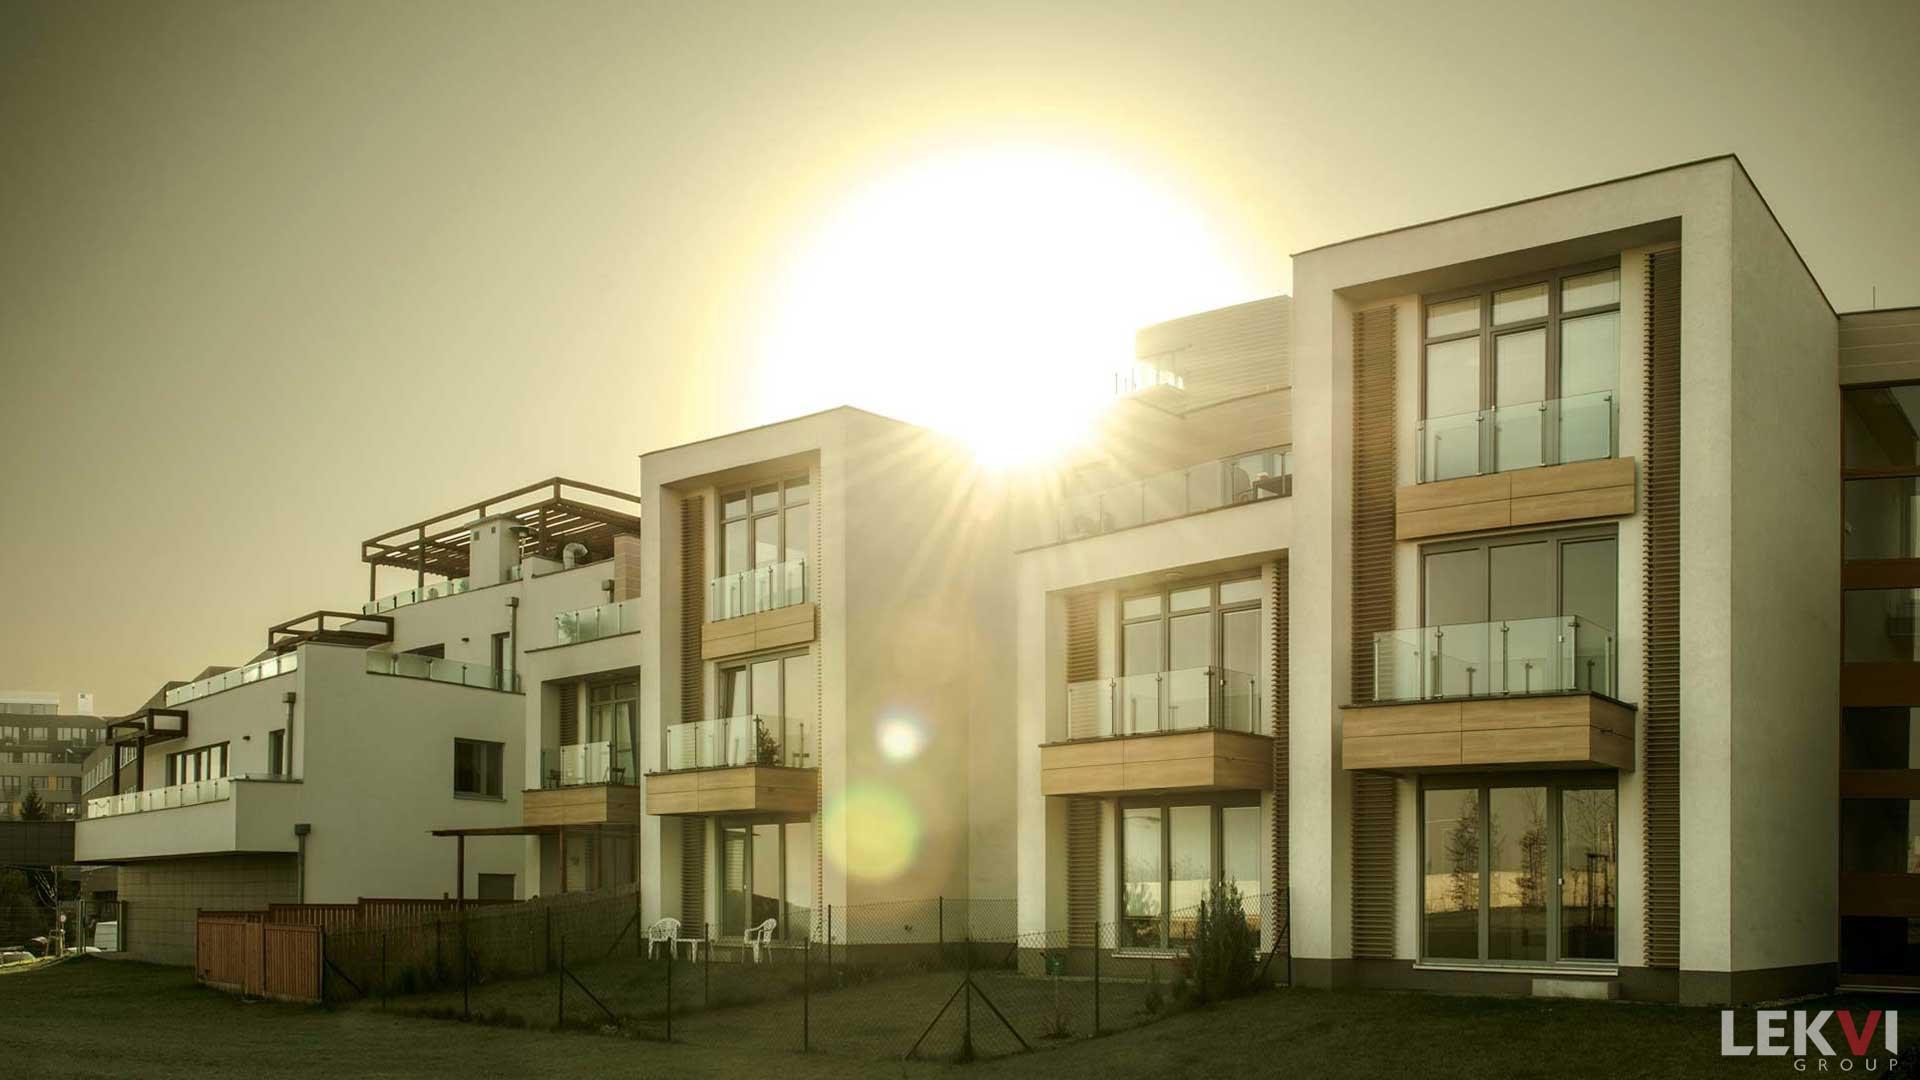 Prodej bytu 2+kk, 58 m2 - Chlupáčova, Praha 5